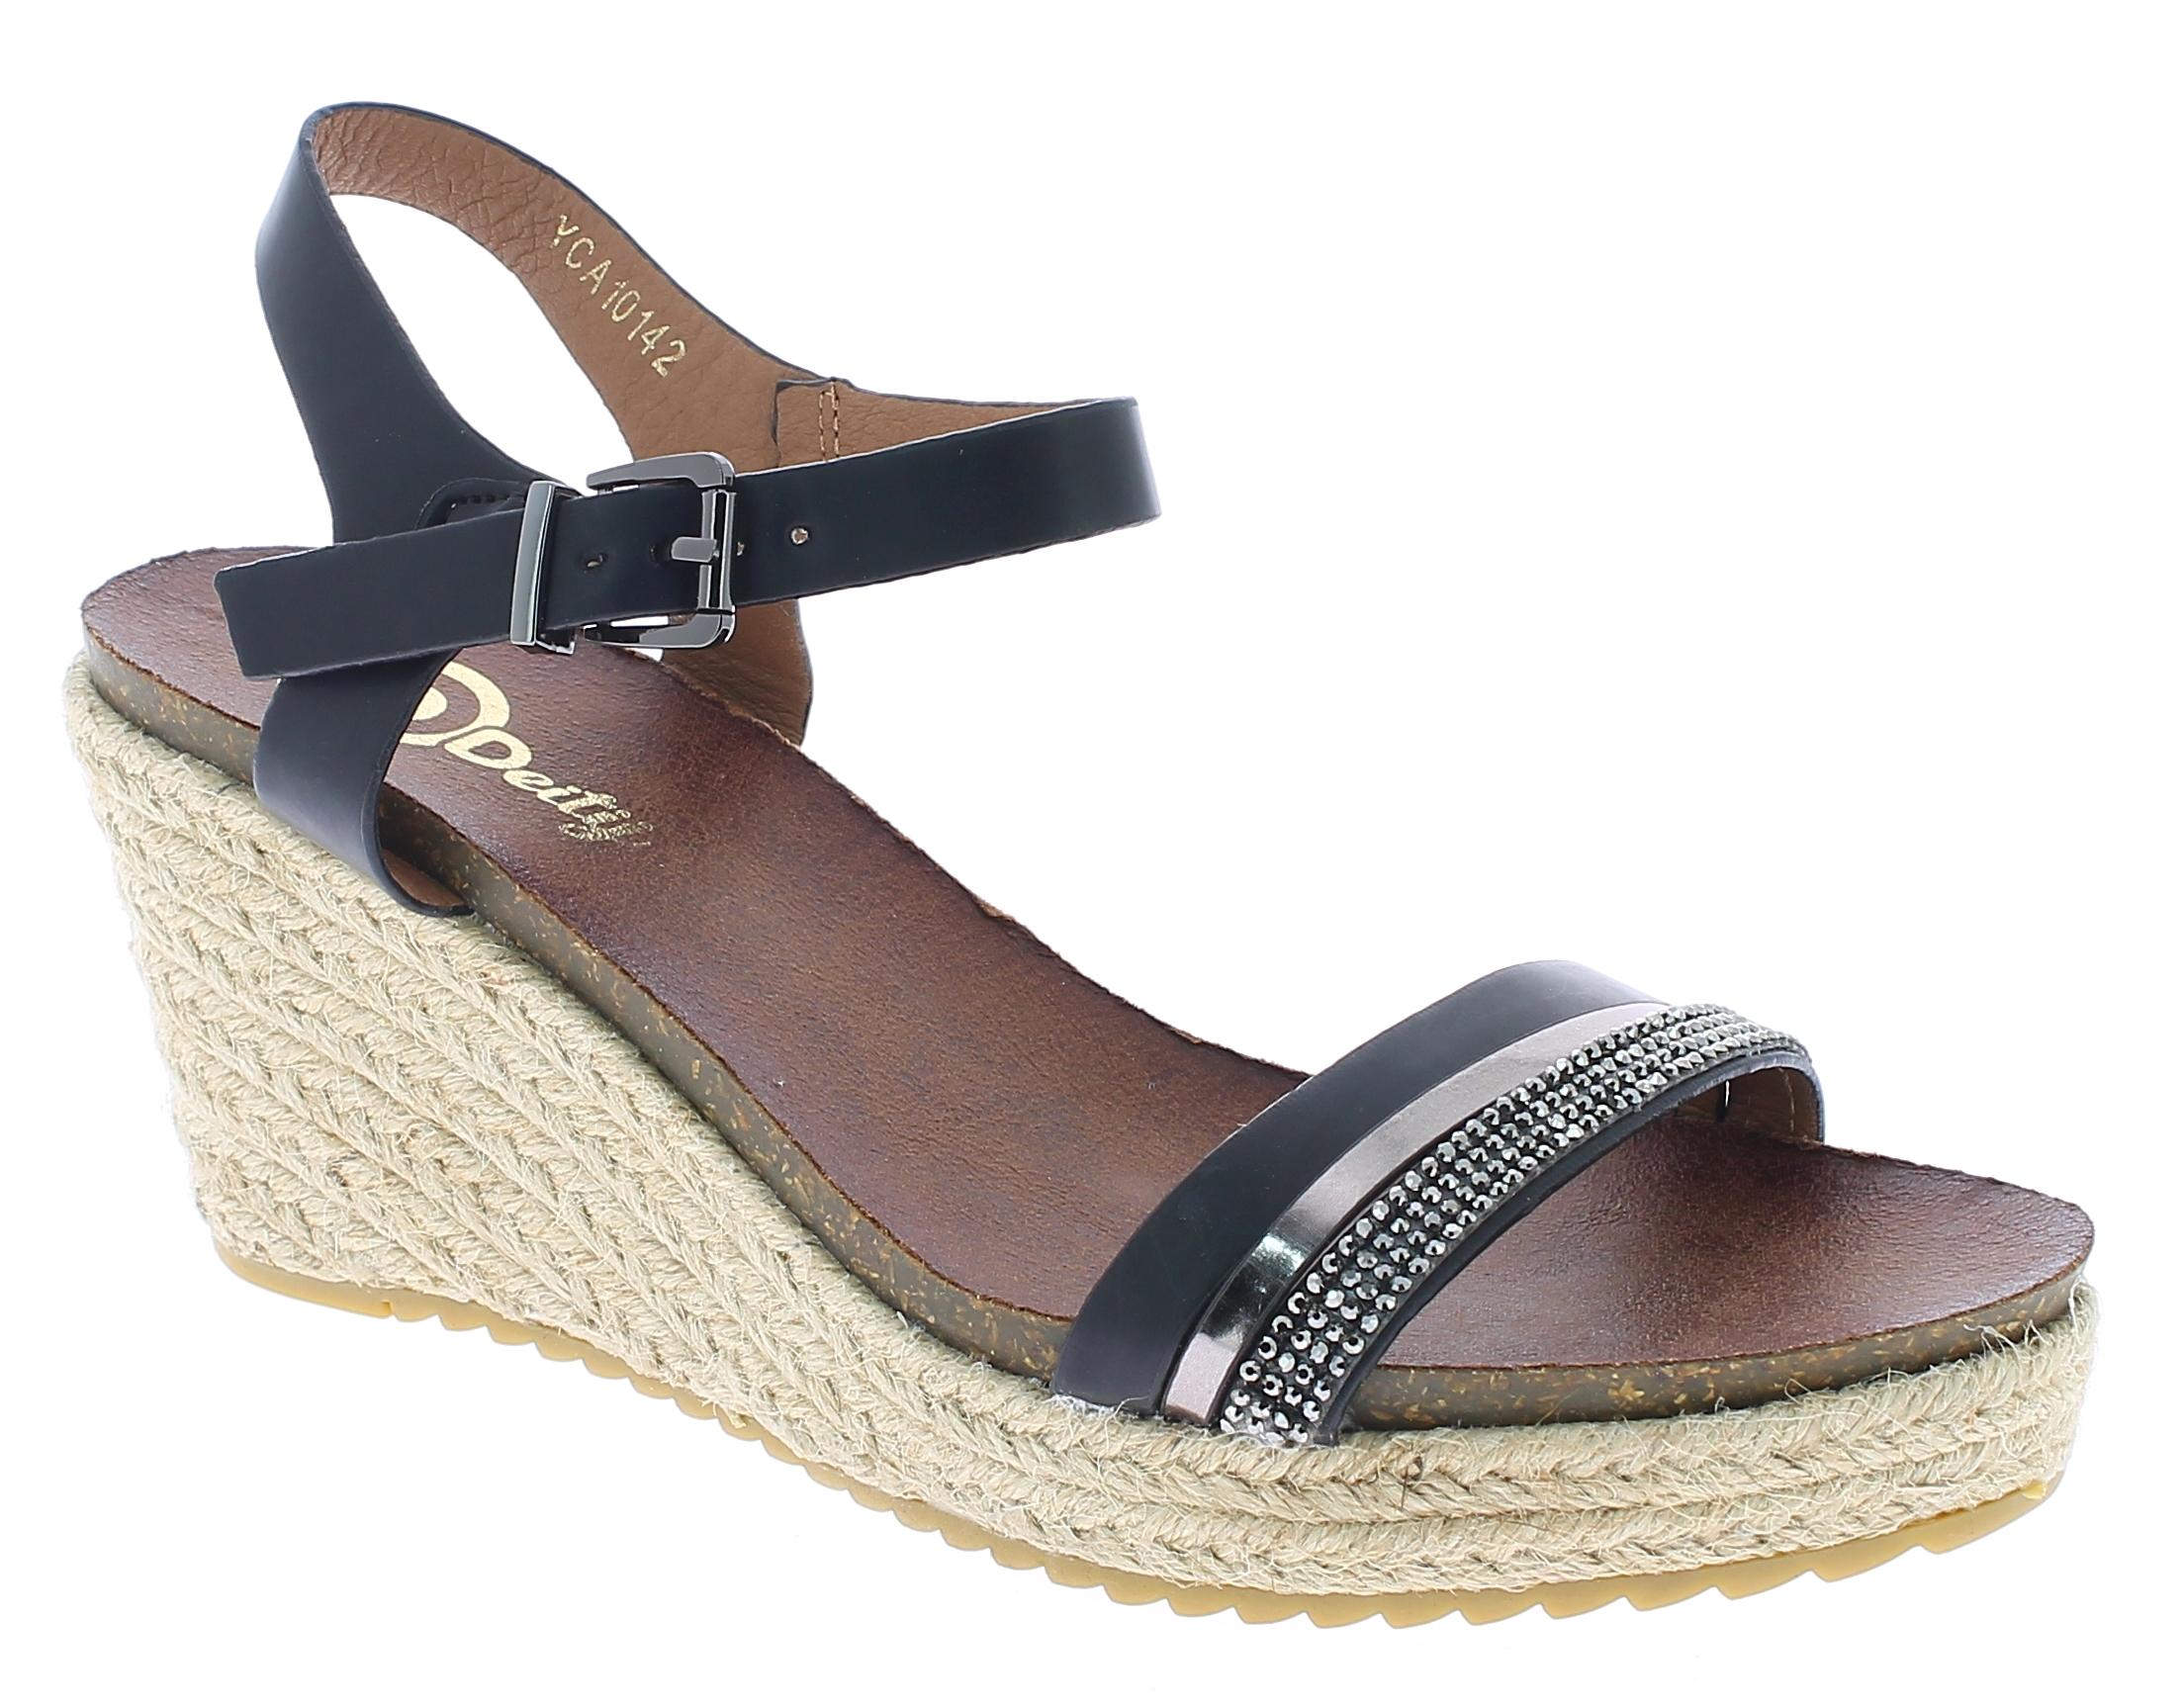 DEITIJ Γυναικεία Πλατφόρμα YCA10142 Μαύρο - IqShoes - YCA10142 BLACK-black-37/1/ παπούτσια  γυναικείες πλατφόρμες